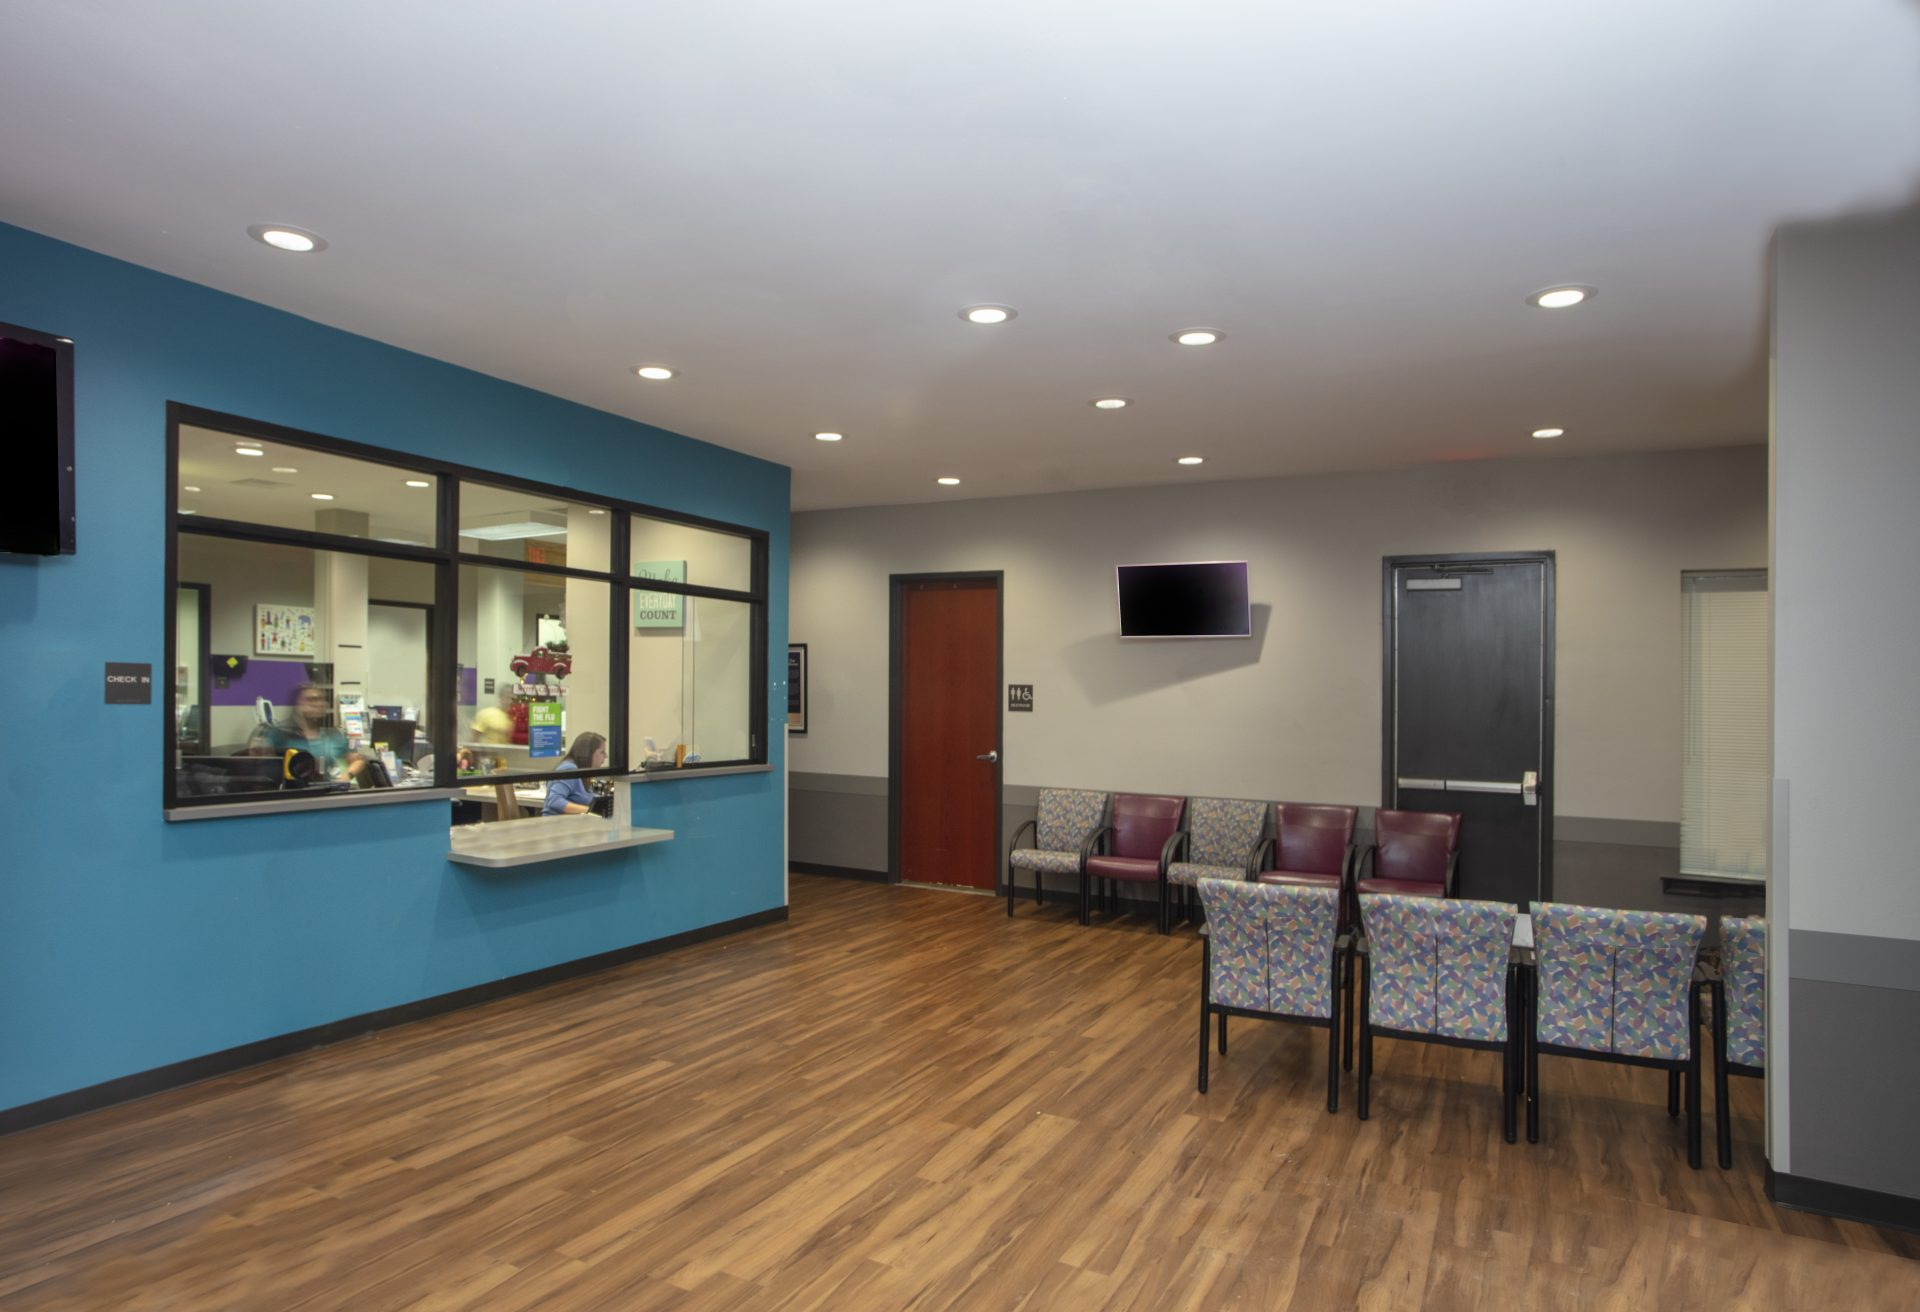 Waiting area at St. Elizabeth Pediatric Clinic.